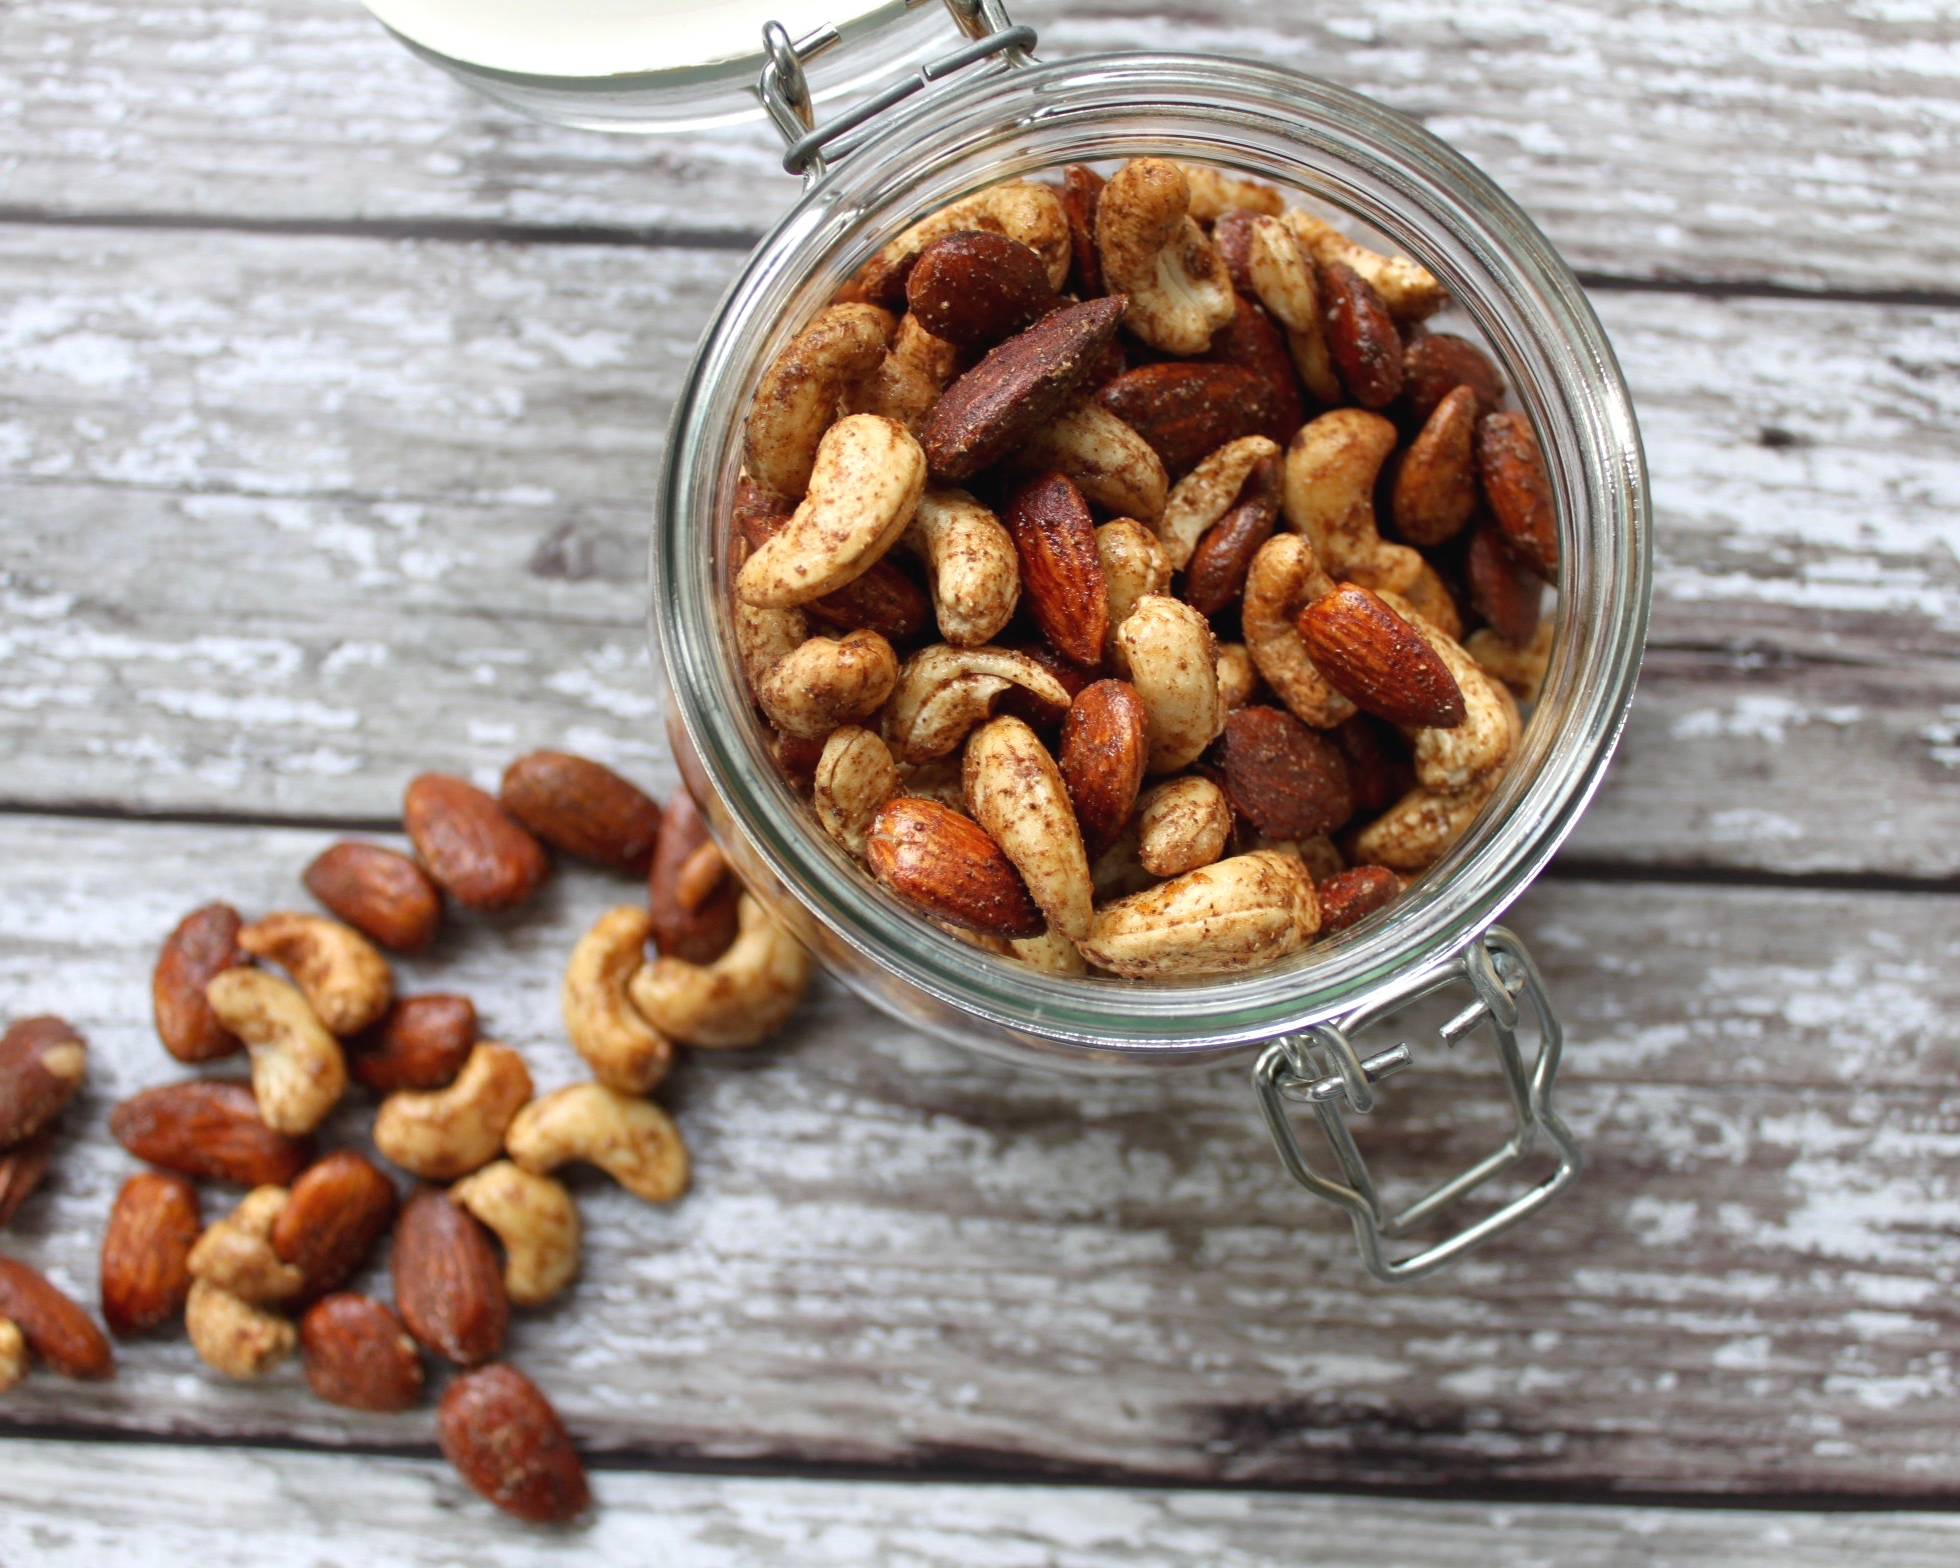 Maple+%26+Five-Spice+Roast+Nuts+Nourish+by+Rebecca.jpg